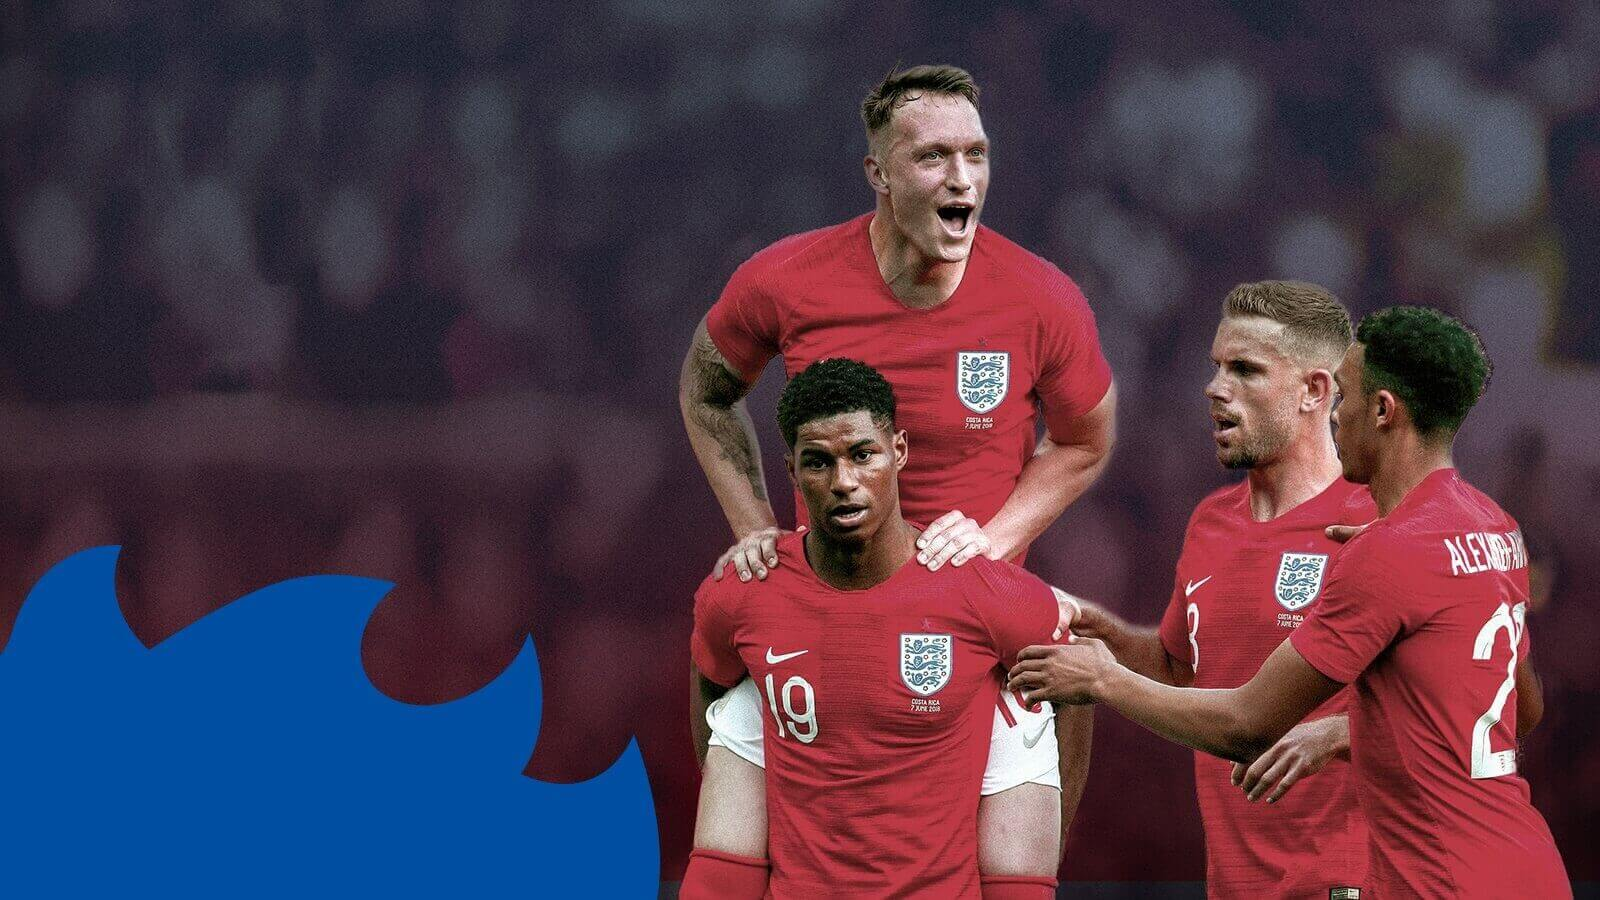 England wc squad betting websites envigado vs medellin win sports betting